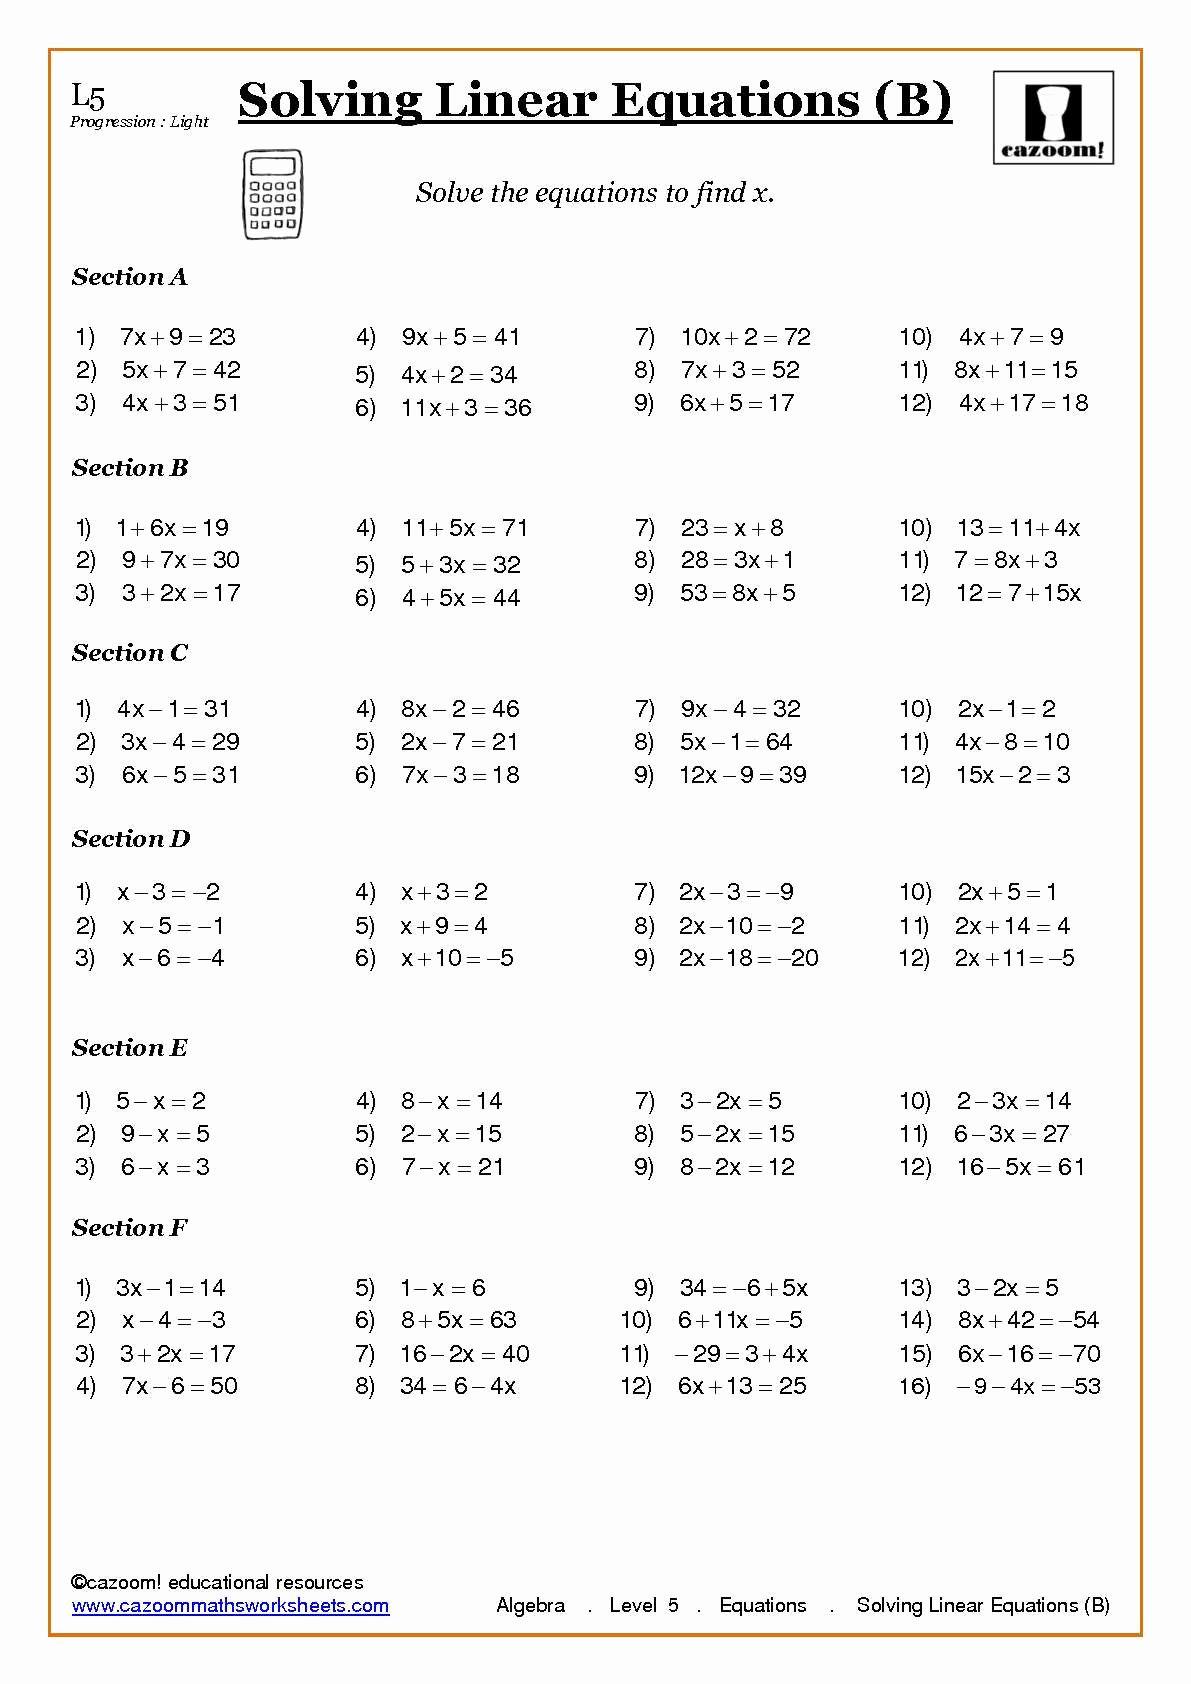 Algebra 2 Worksheet Pdf Elegant Cazoommathsworksheets